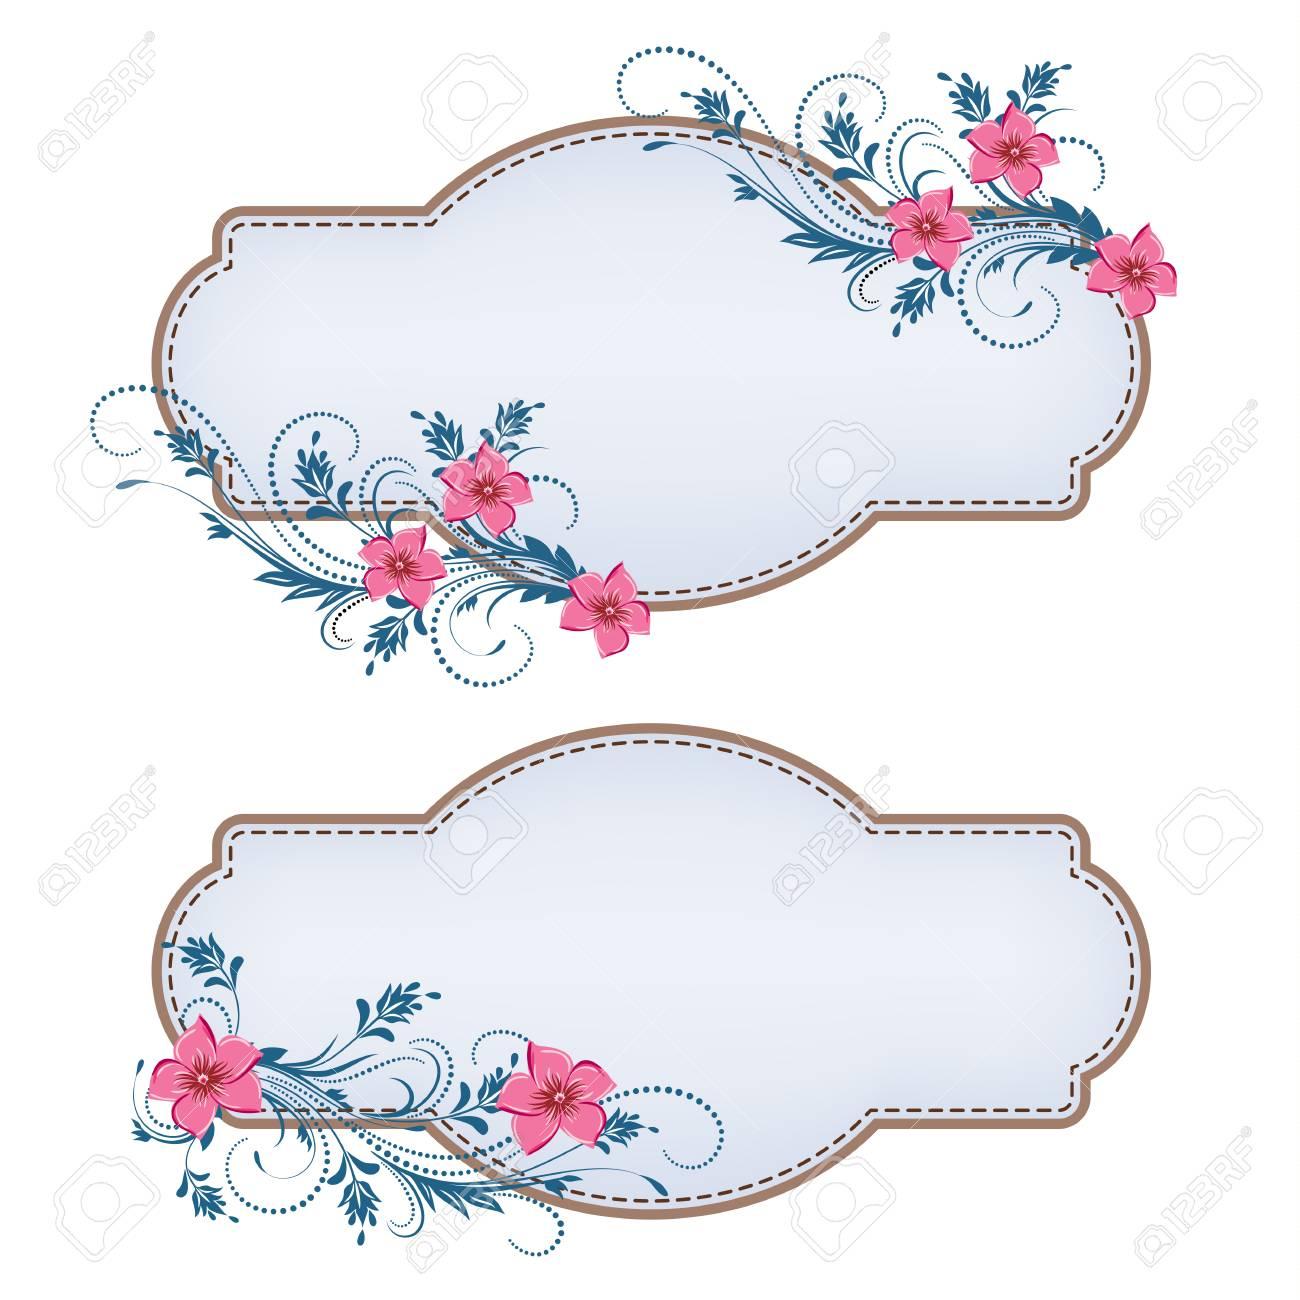 Set decorative labels with floral ornament